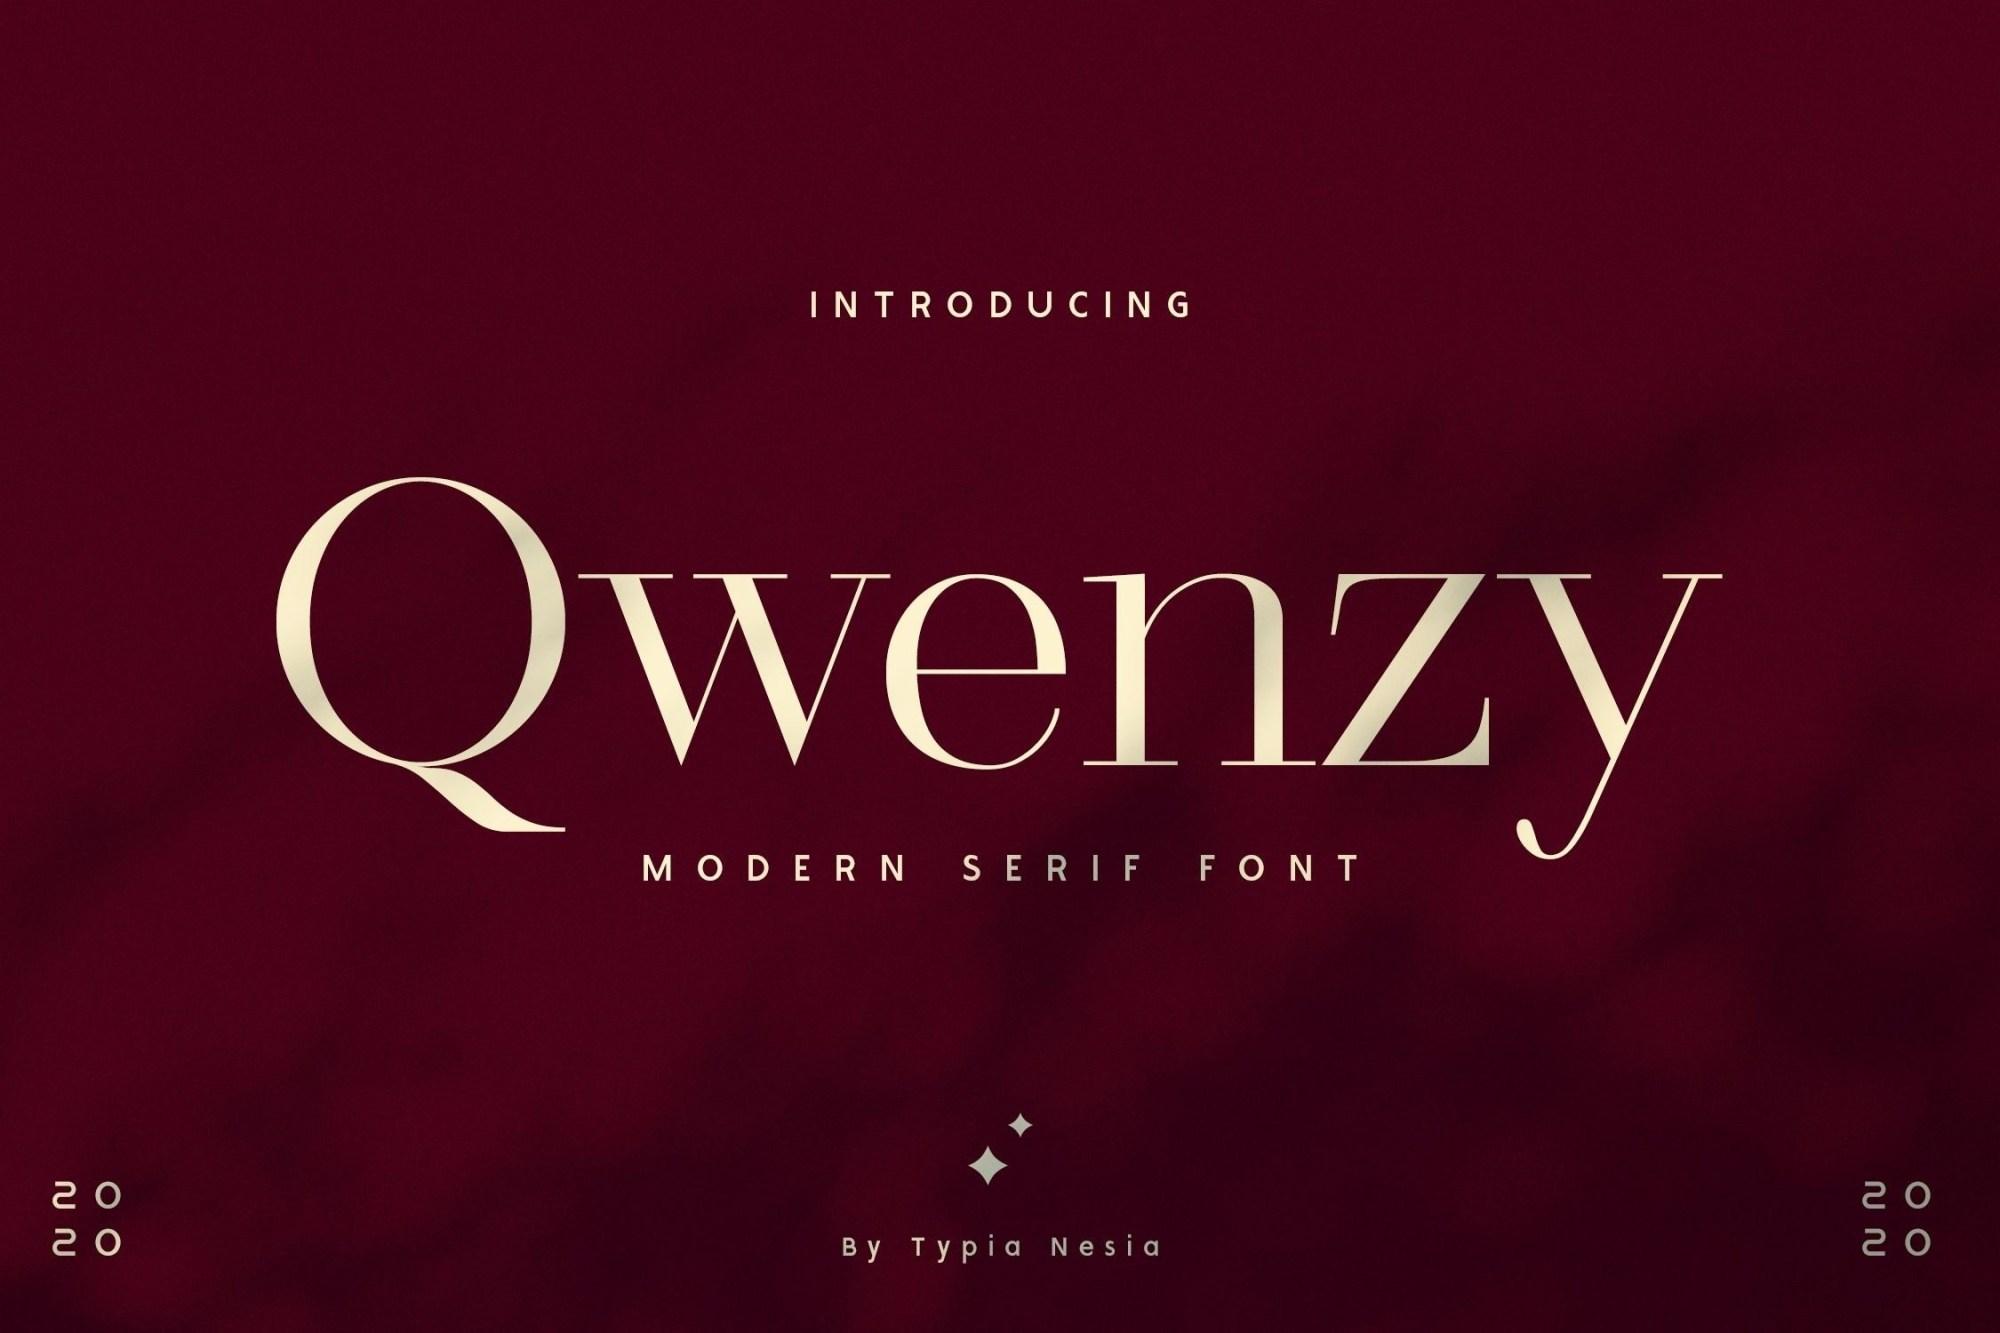 Qwenzy-Modern-Serif-Font-1-1